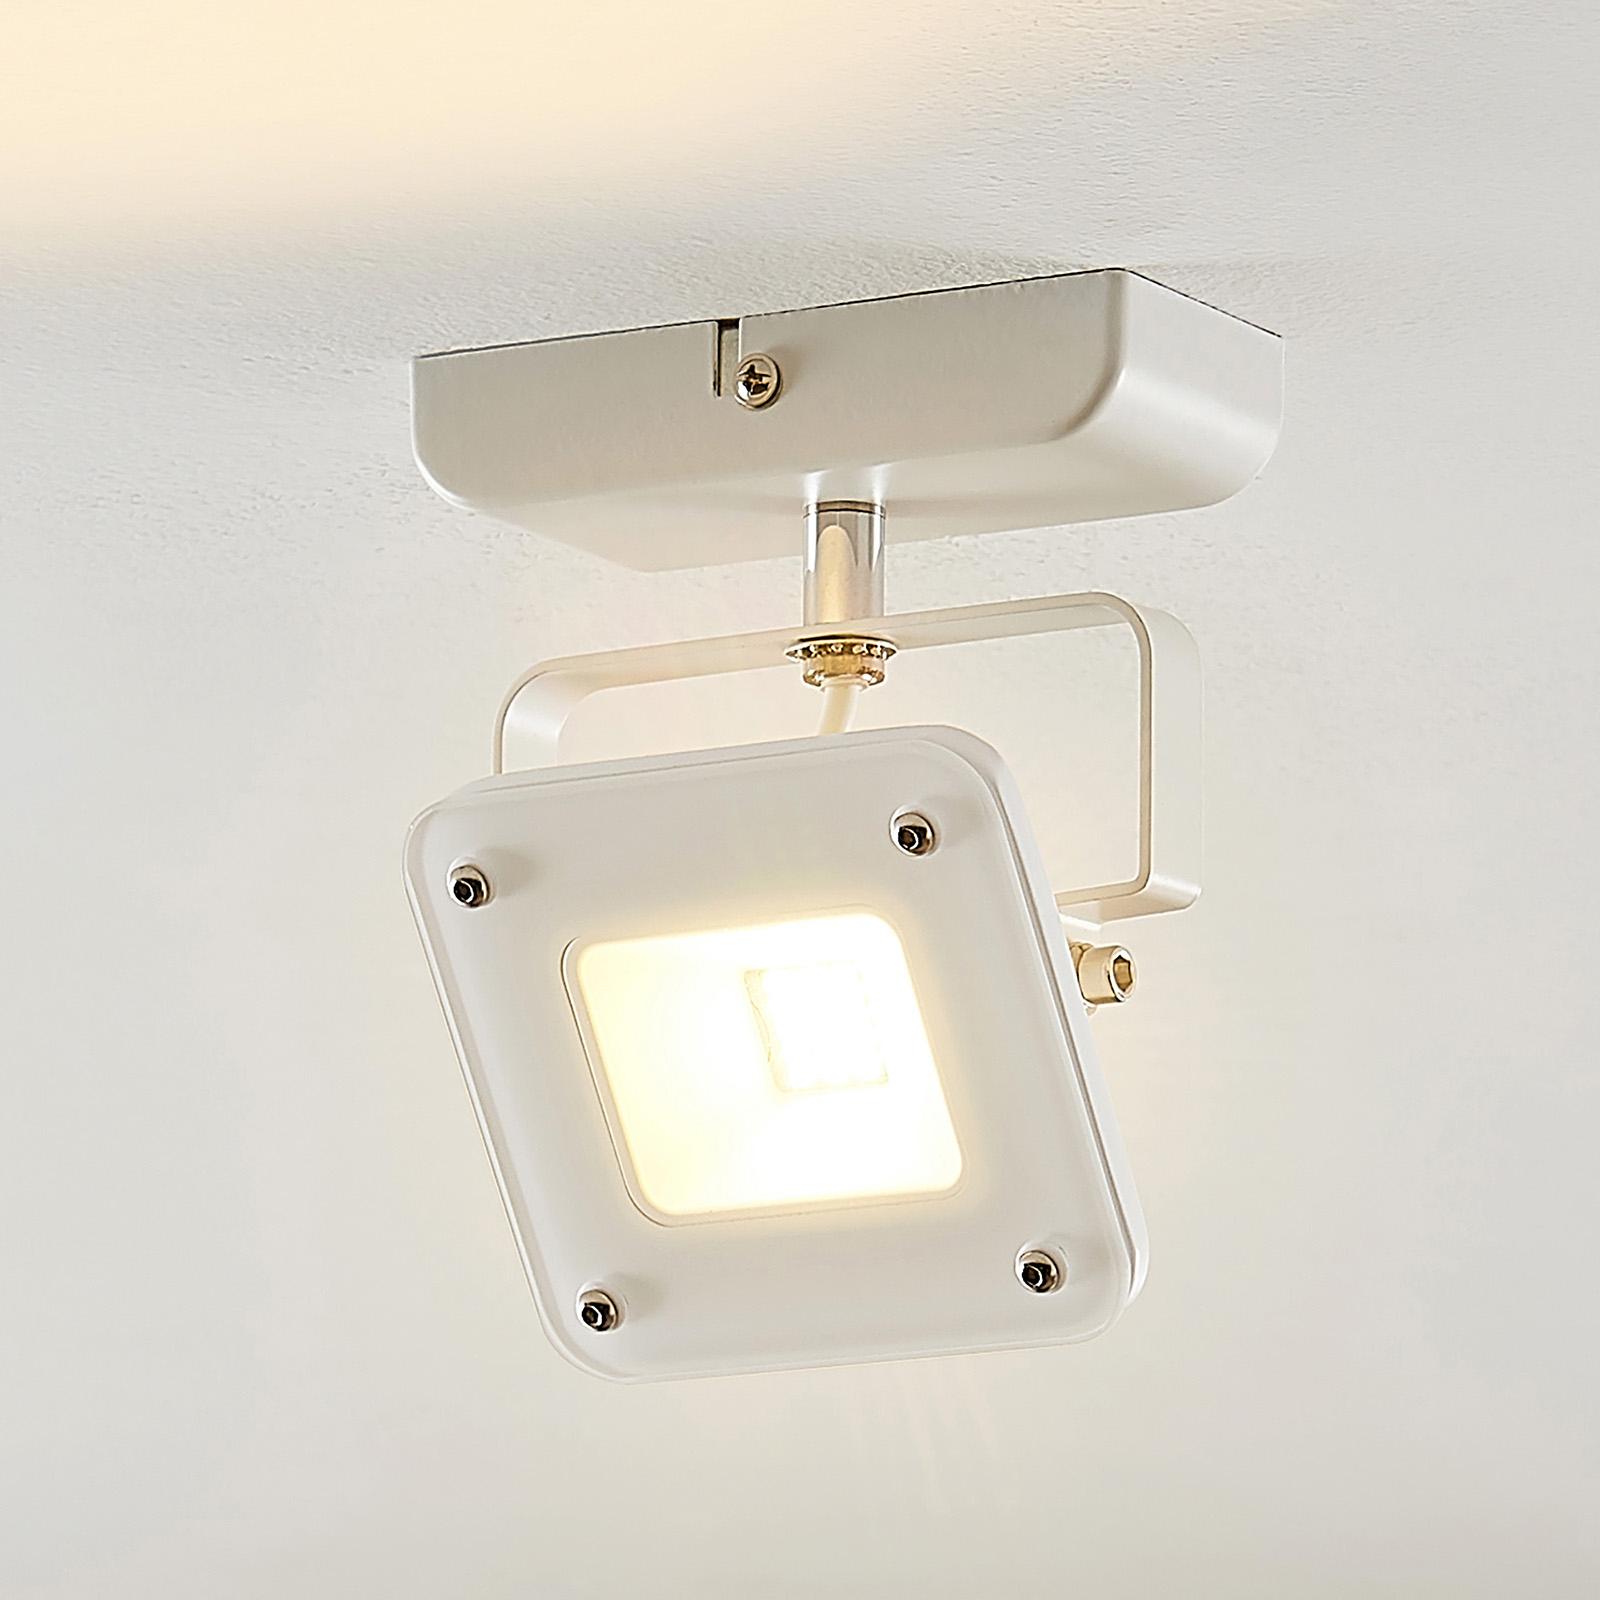 LED-Strahler Juliana, weiß, dimmbar, 1-flammig